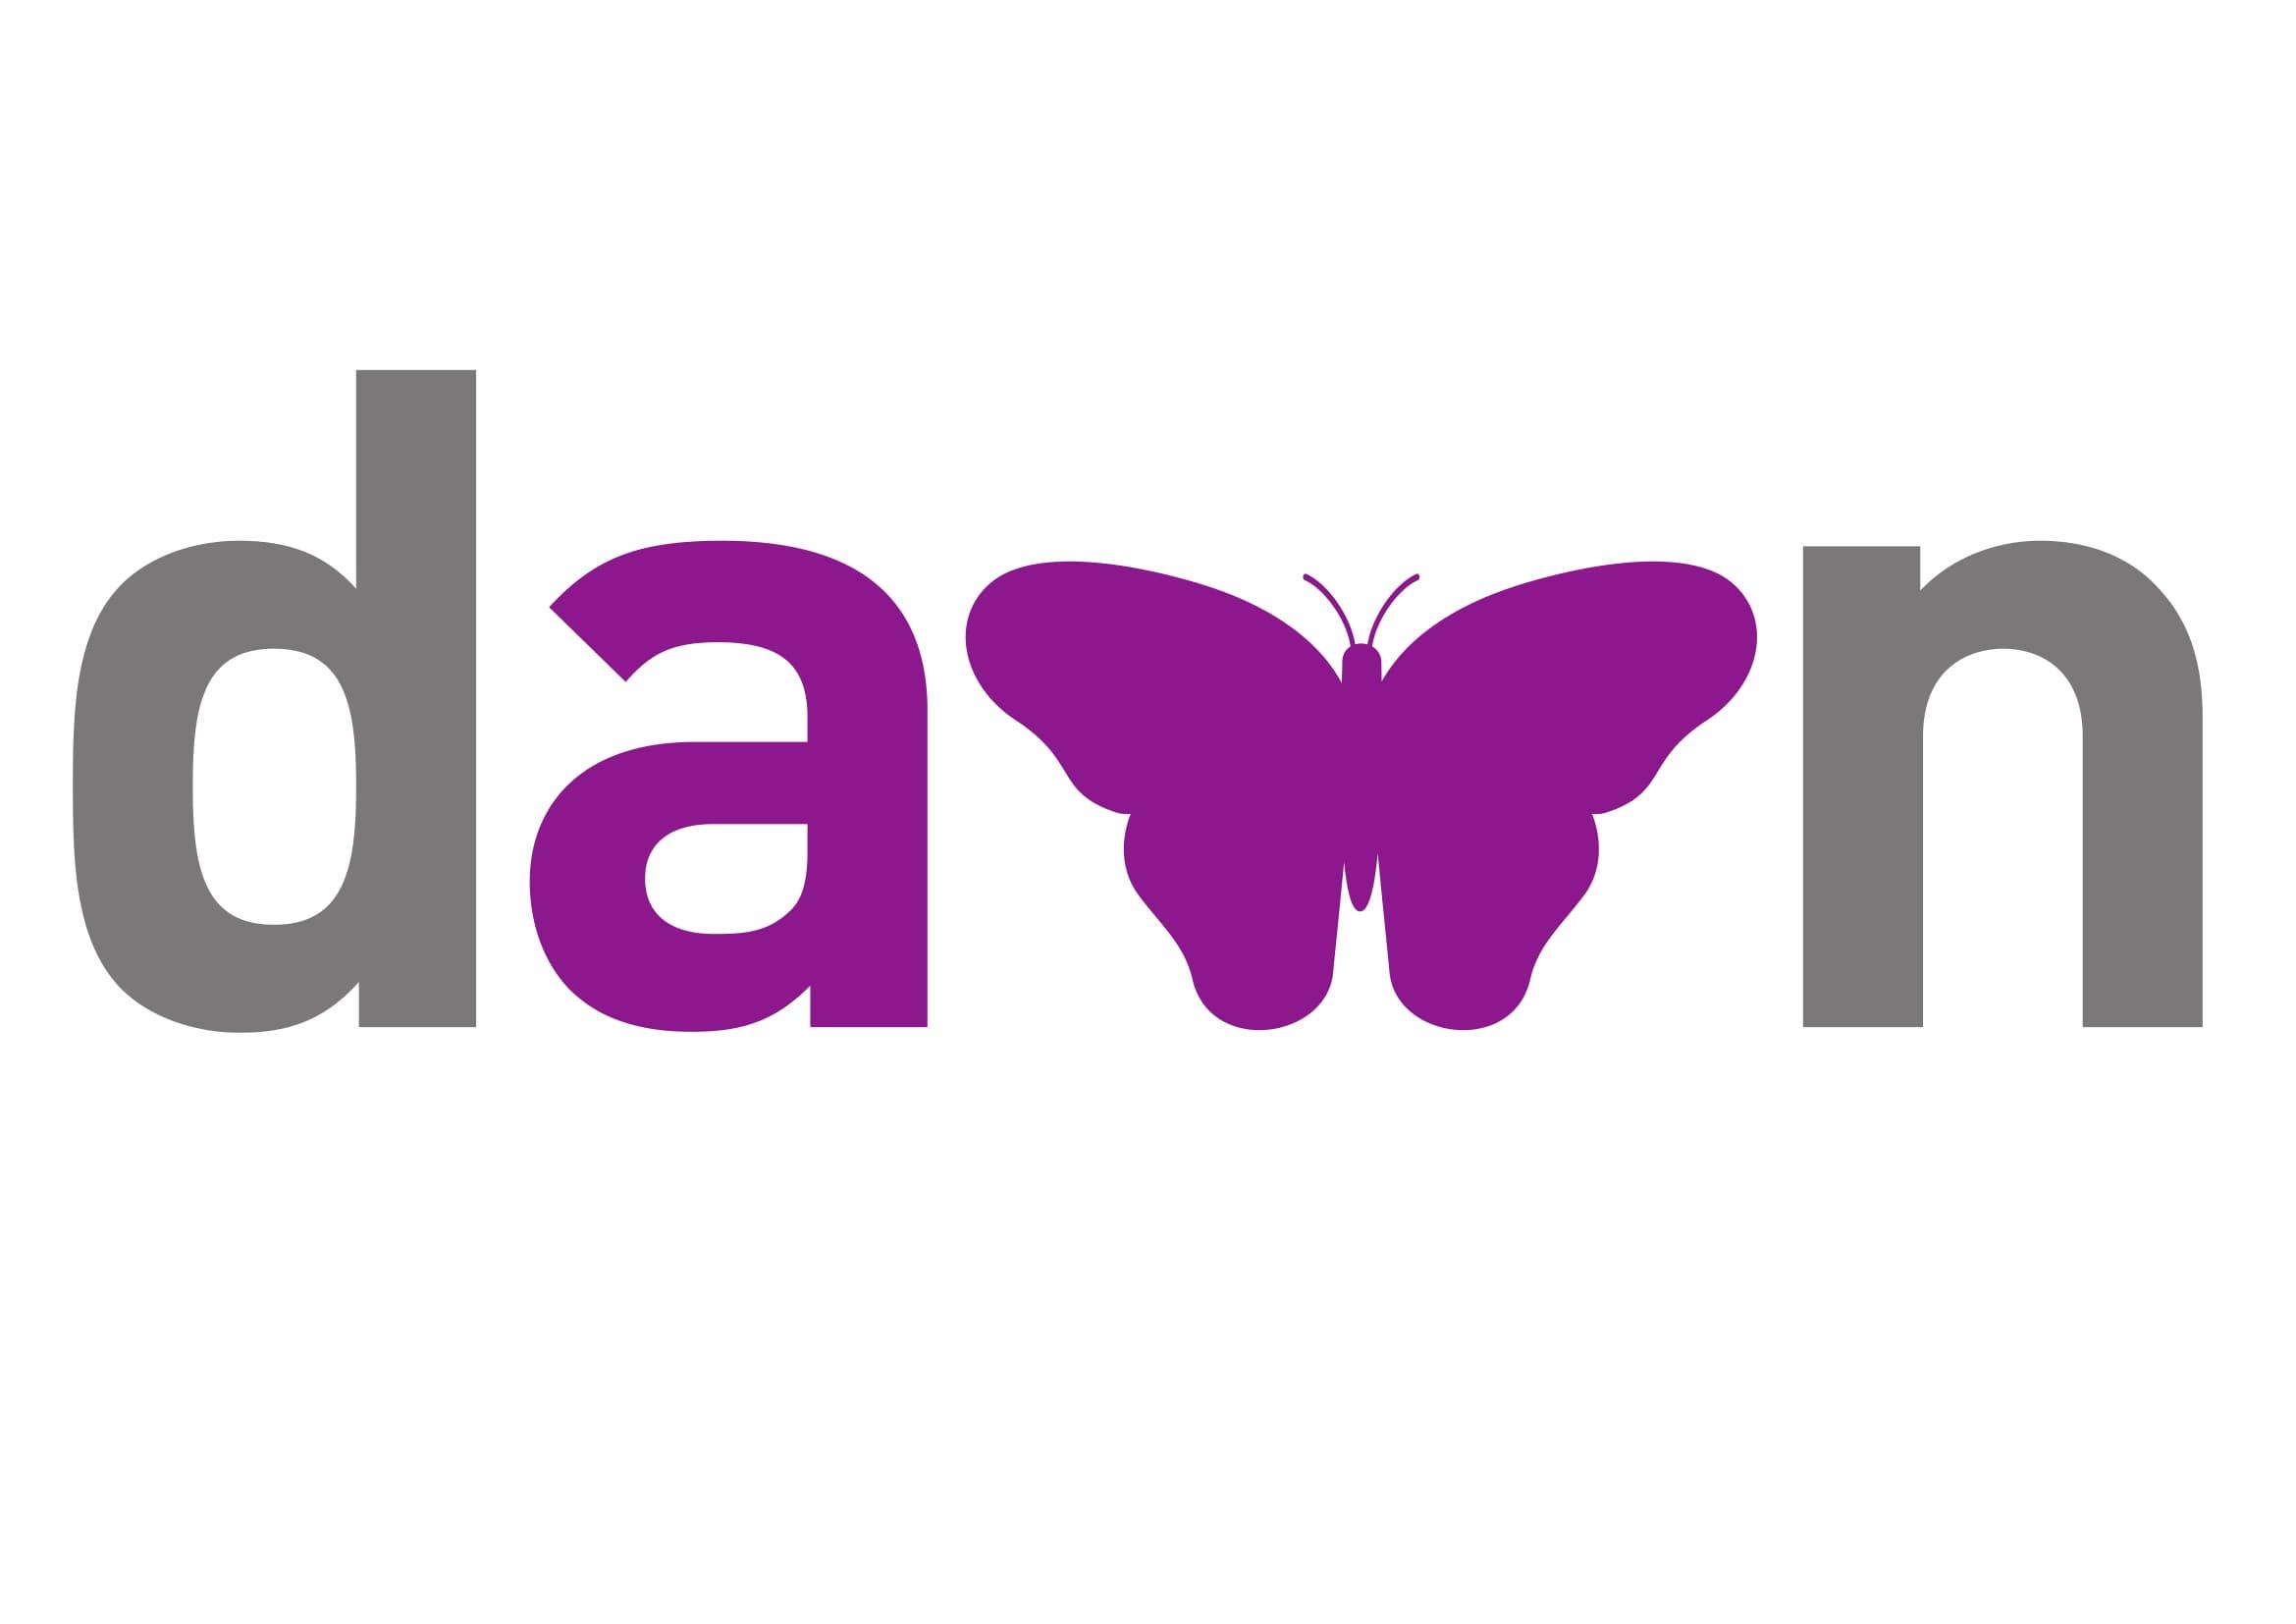 Gay marriage on logo